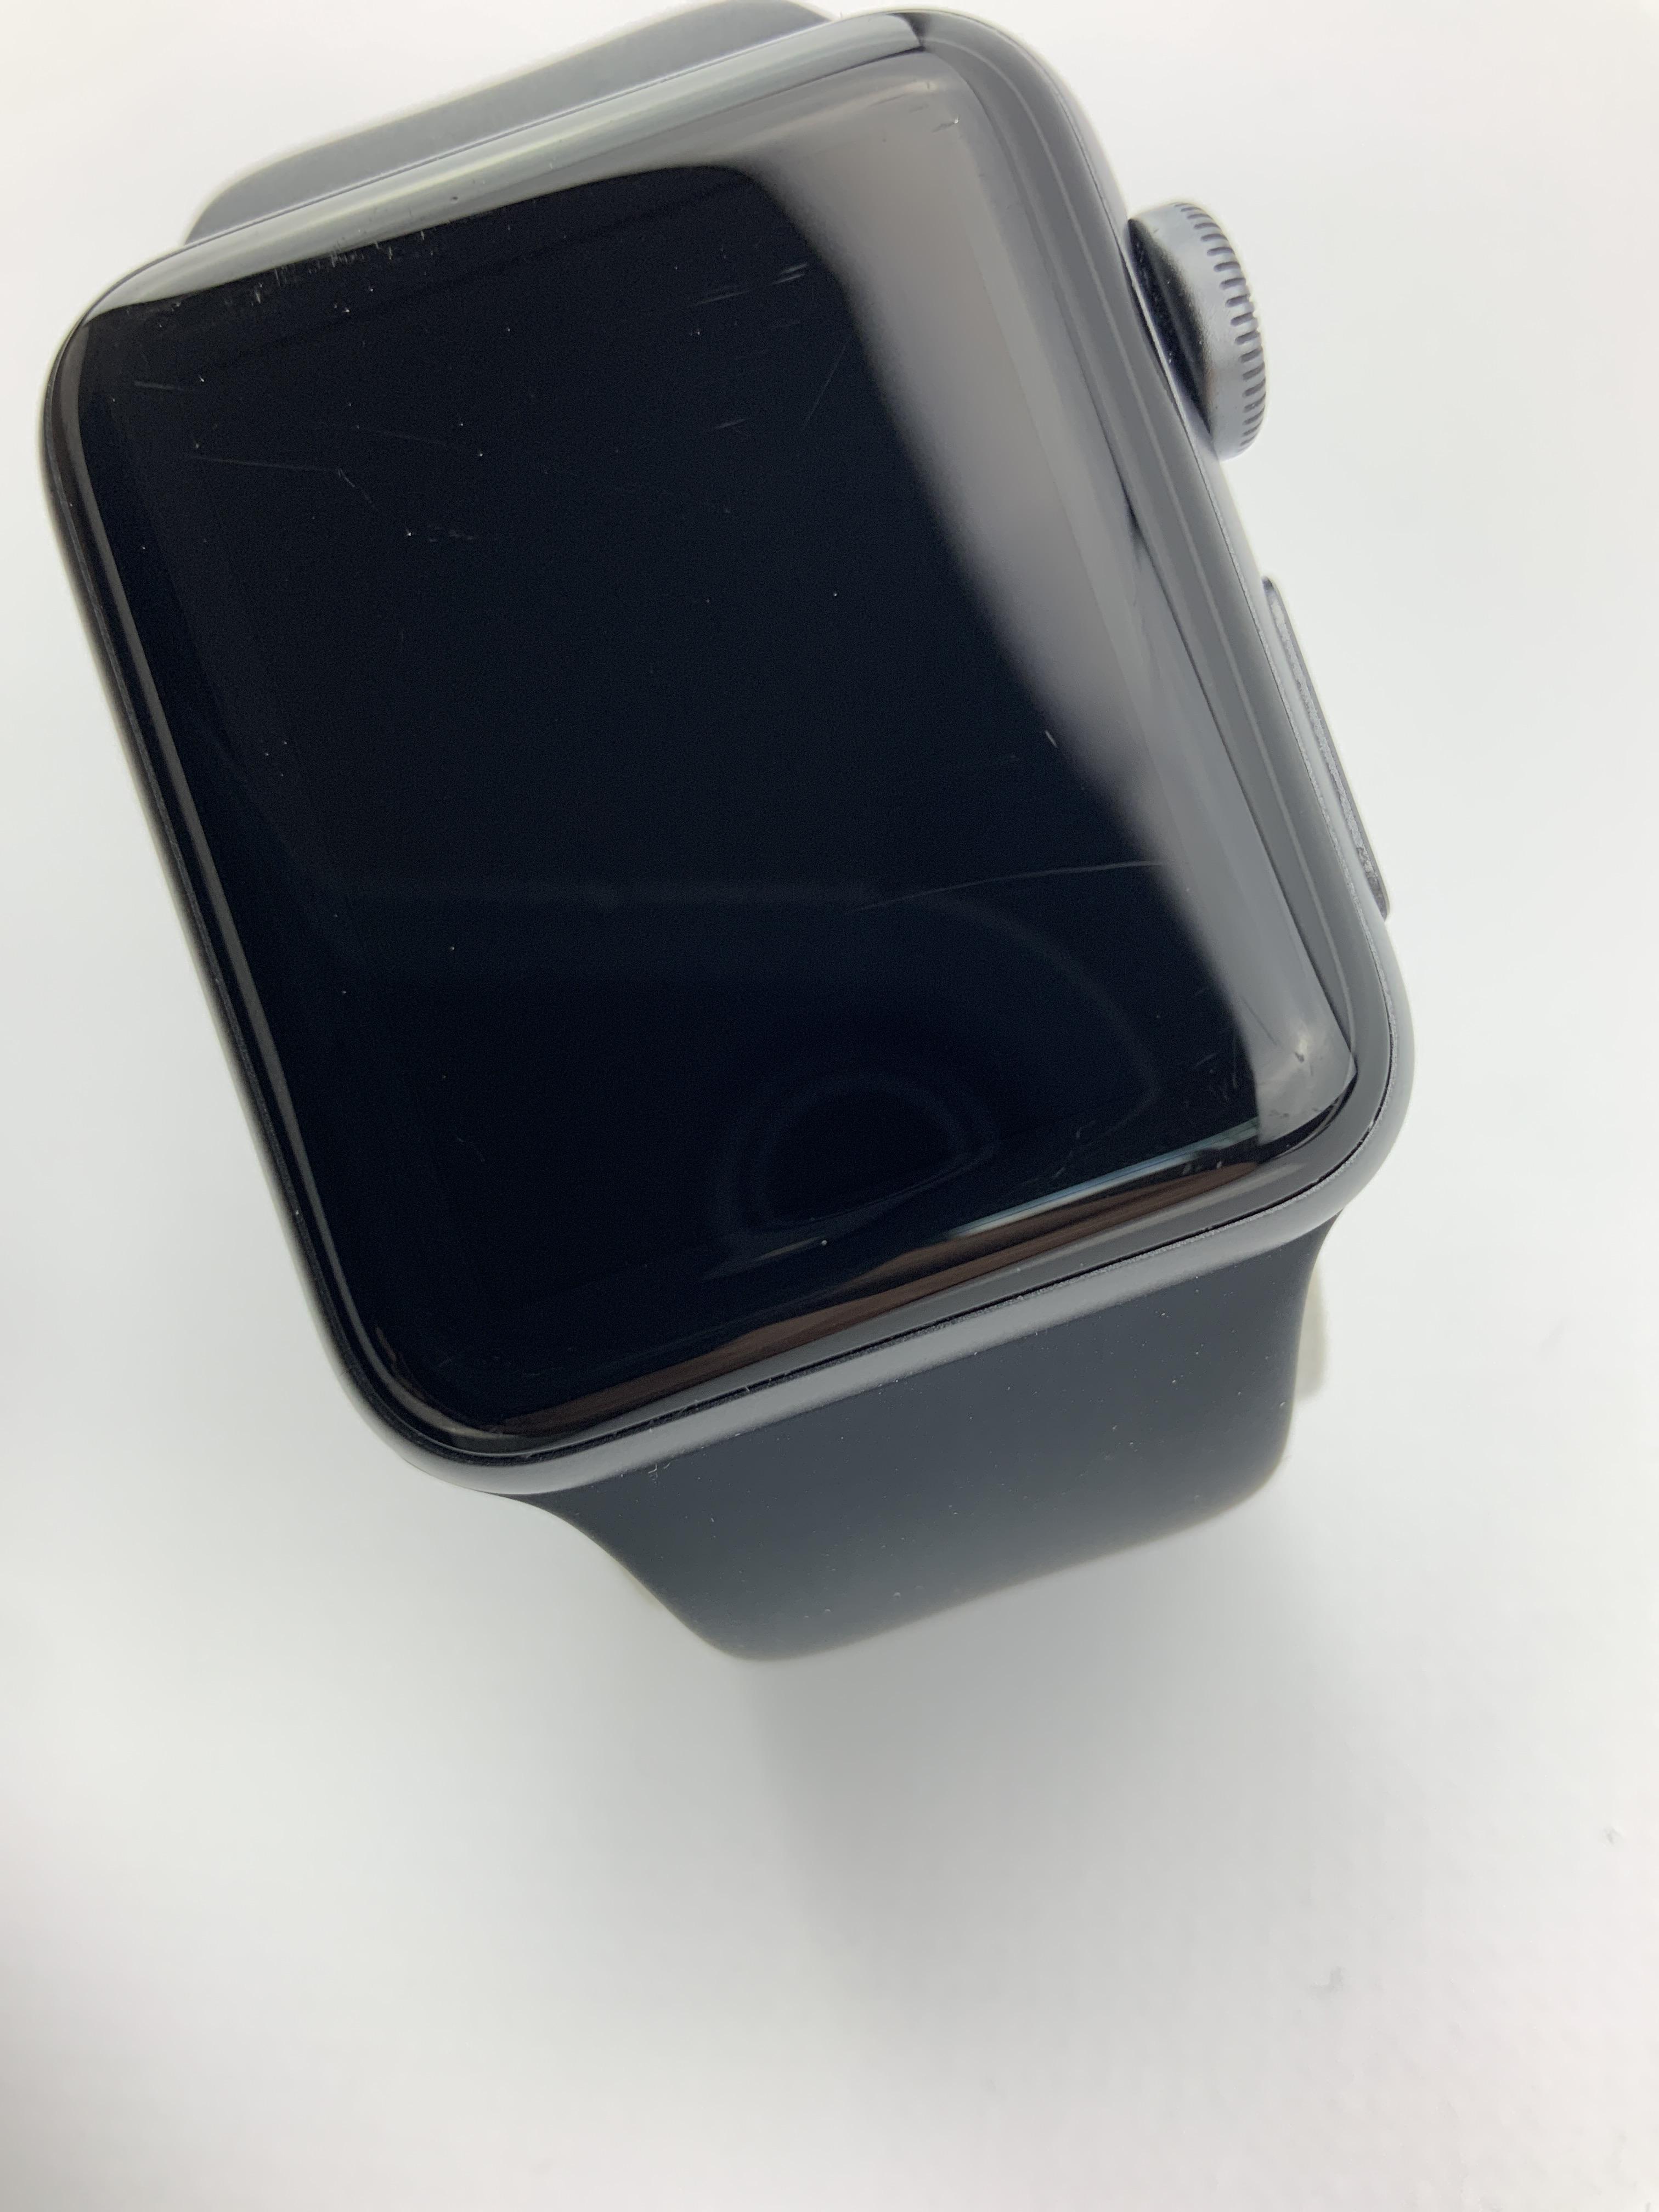 Watch Series 3 Aluminum (38mm), Space Gray, Black Sport Band, imagen 3